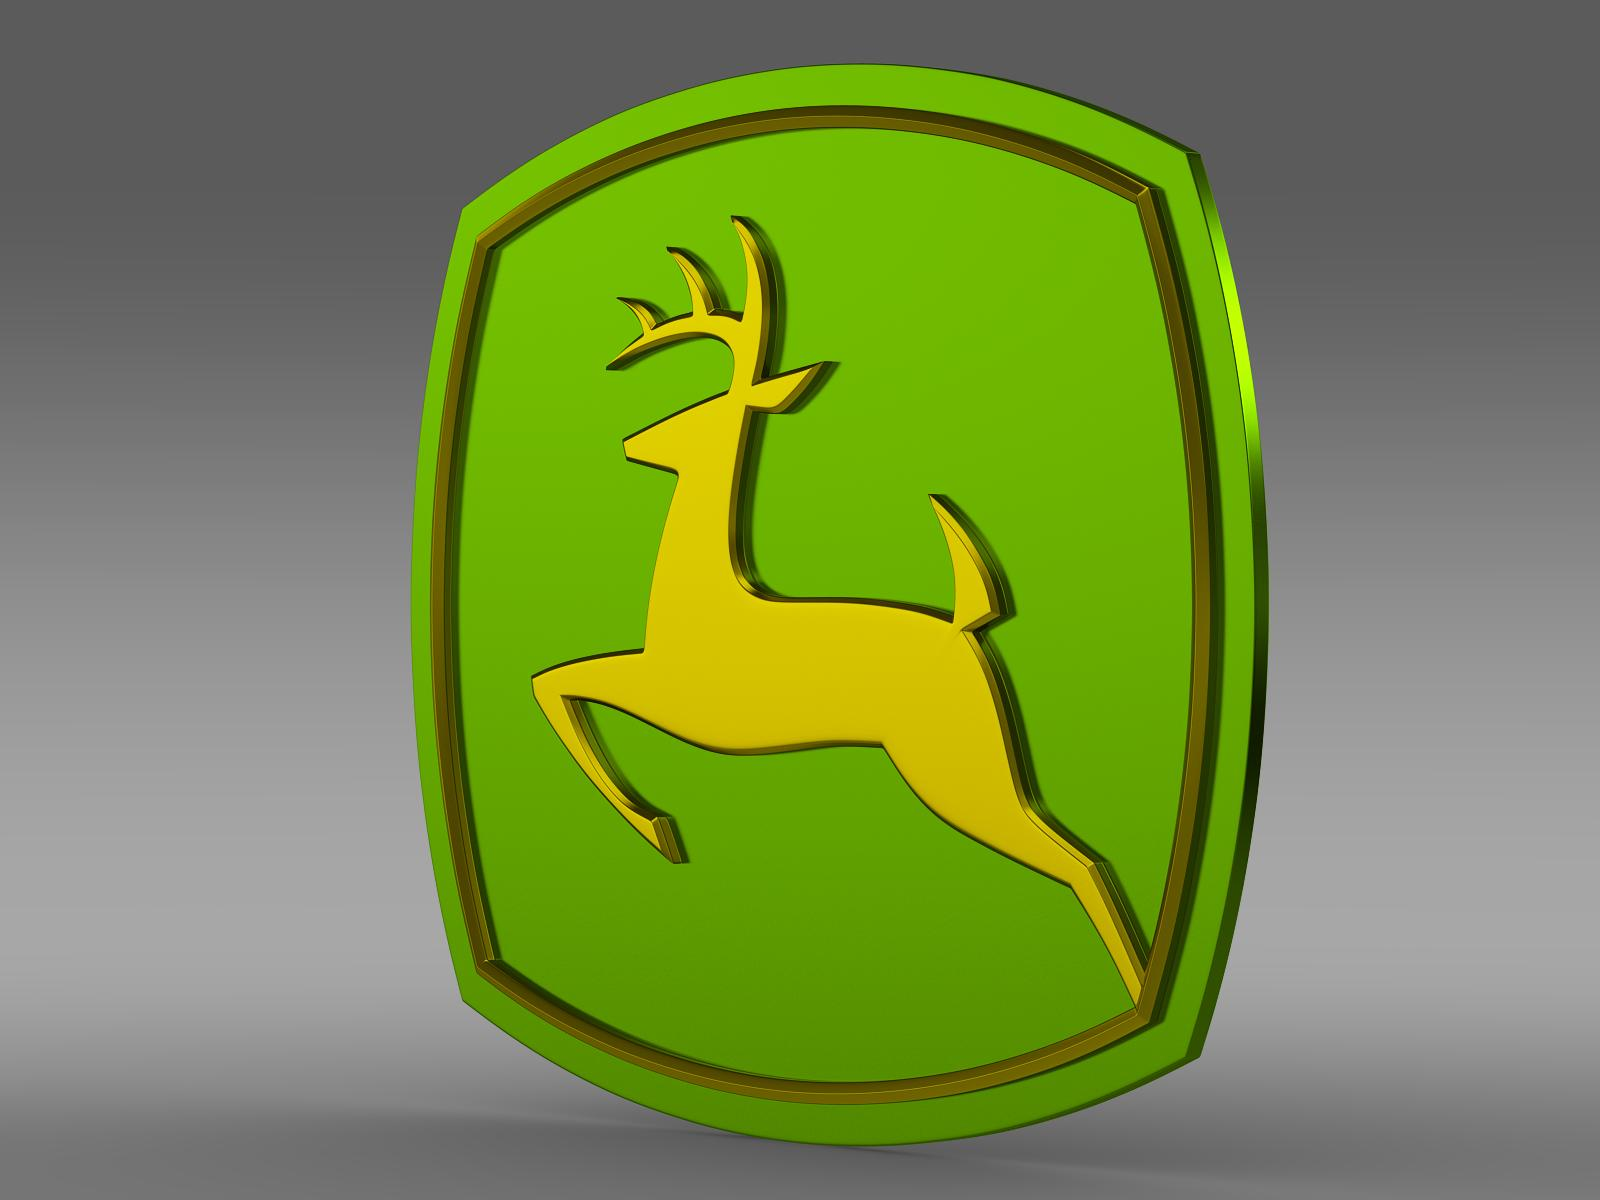 john deer logo 3d model 3ds max fbx c4d lwo ma mb hrc xsi obj 208248